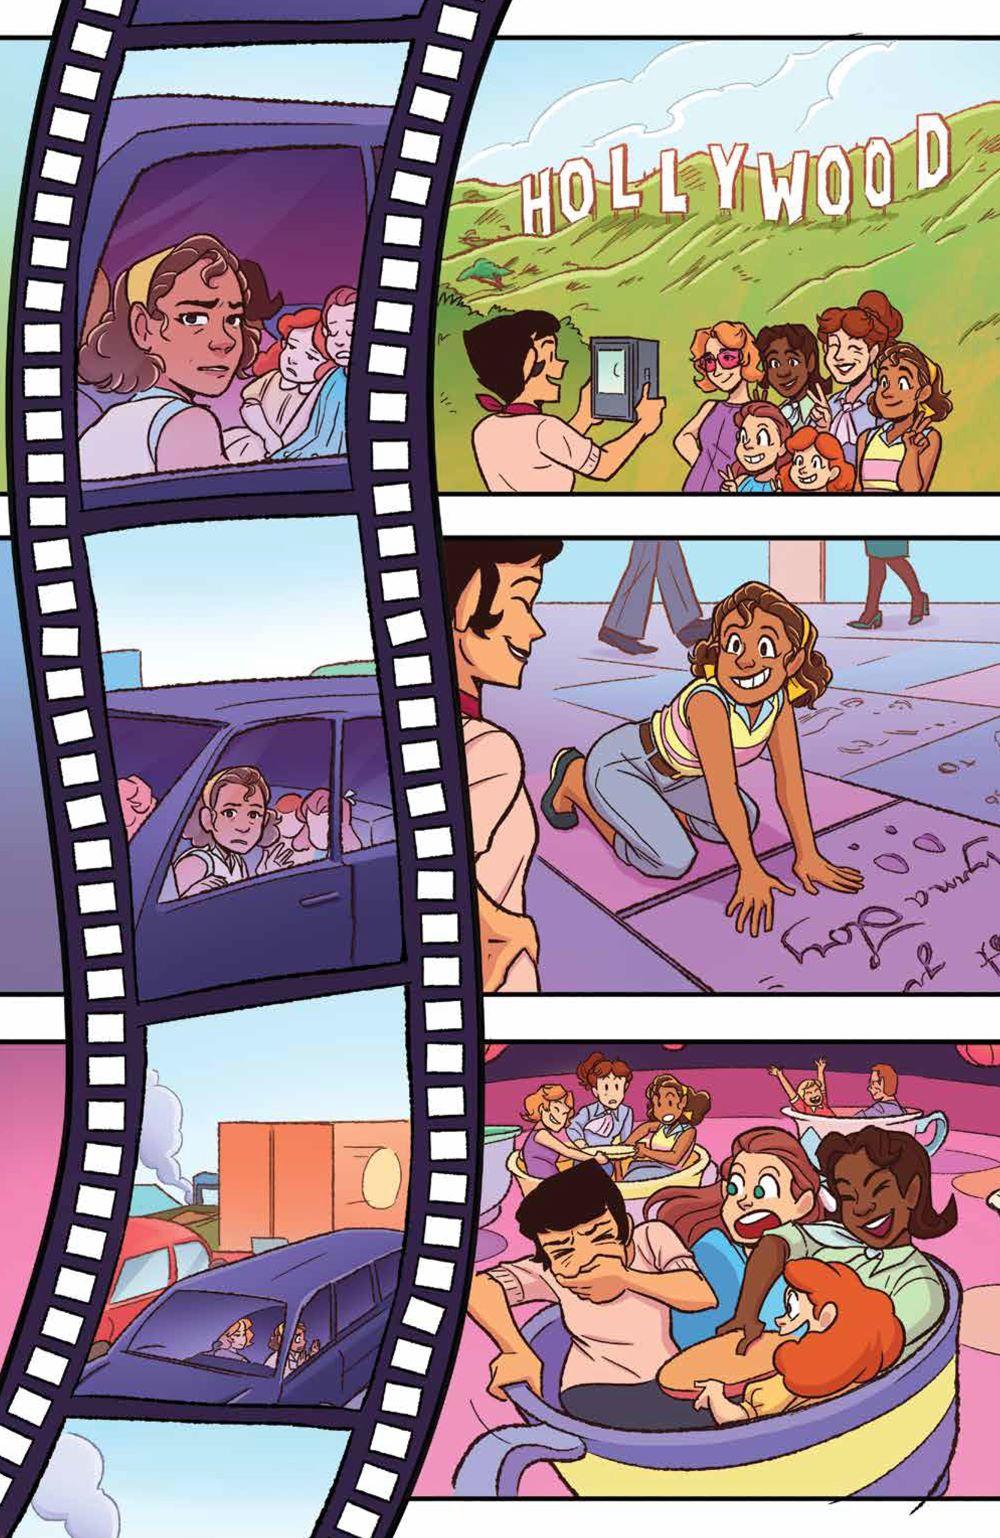 GoldieVance_OGN_LaLaLarceny_SC_PRESS_14 ComicList Previews: GOLDIE VANCE VOLUME 5 LARCENY IN LA LA LAND TP